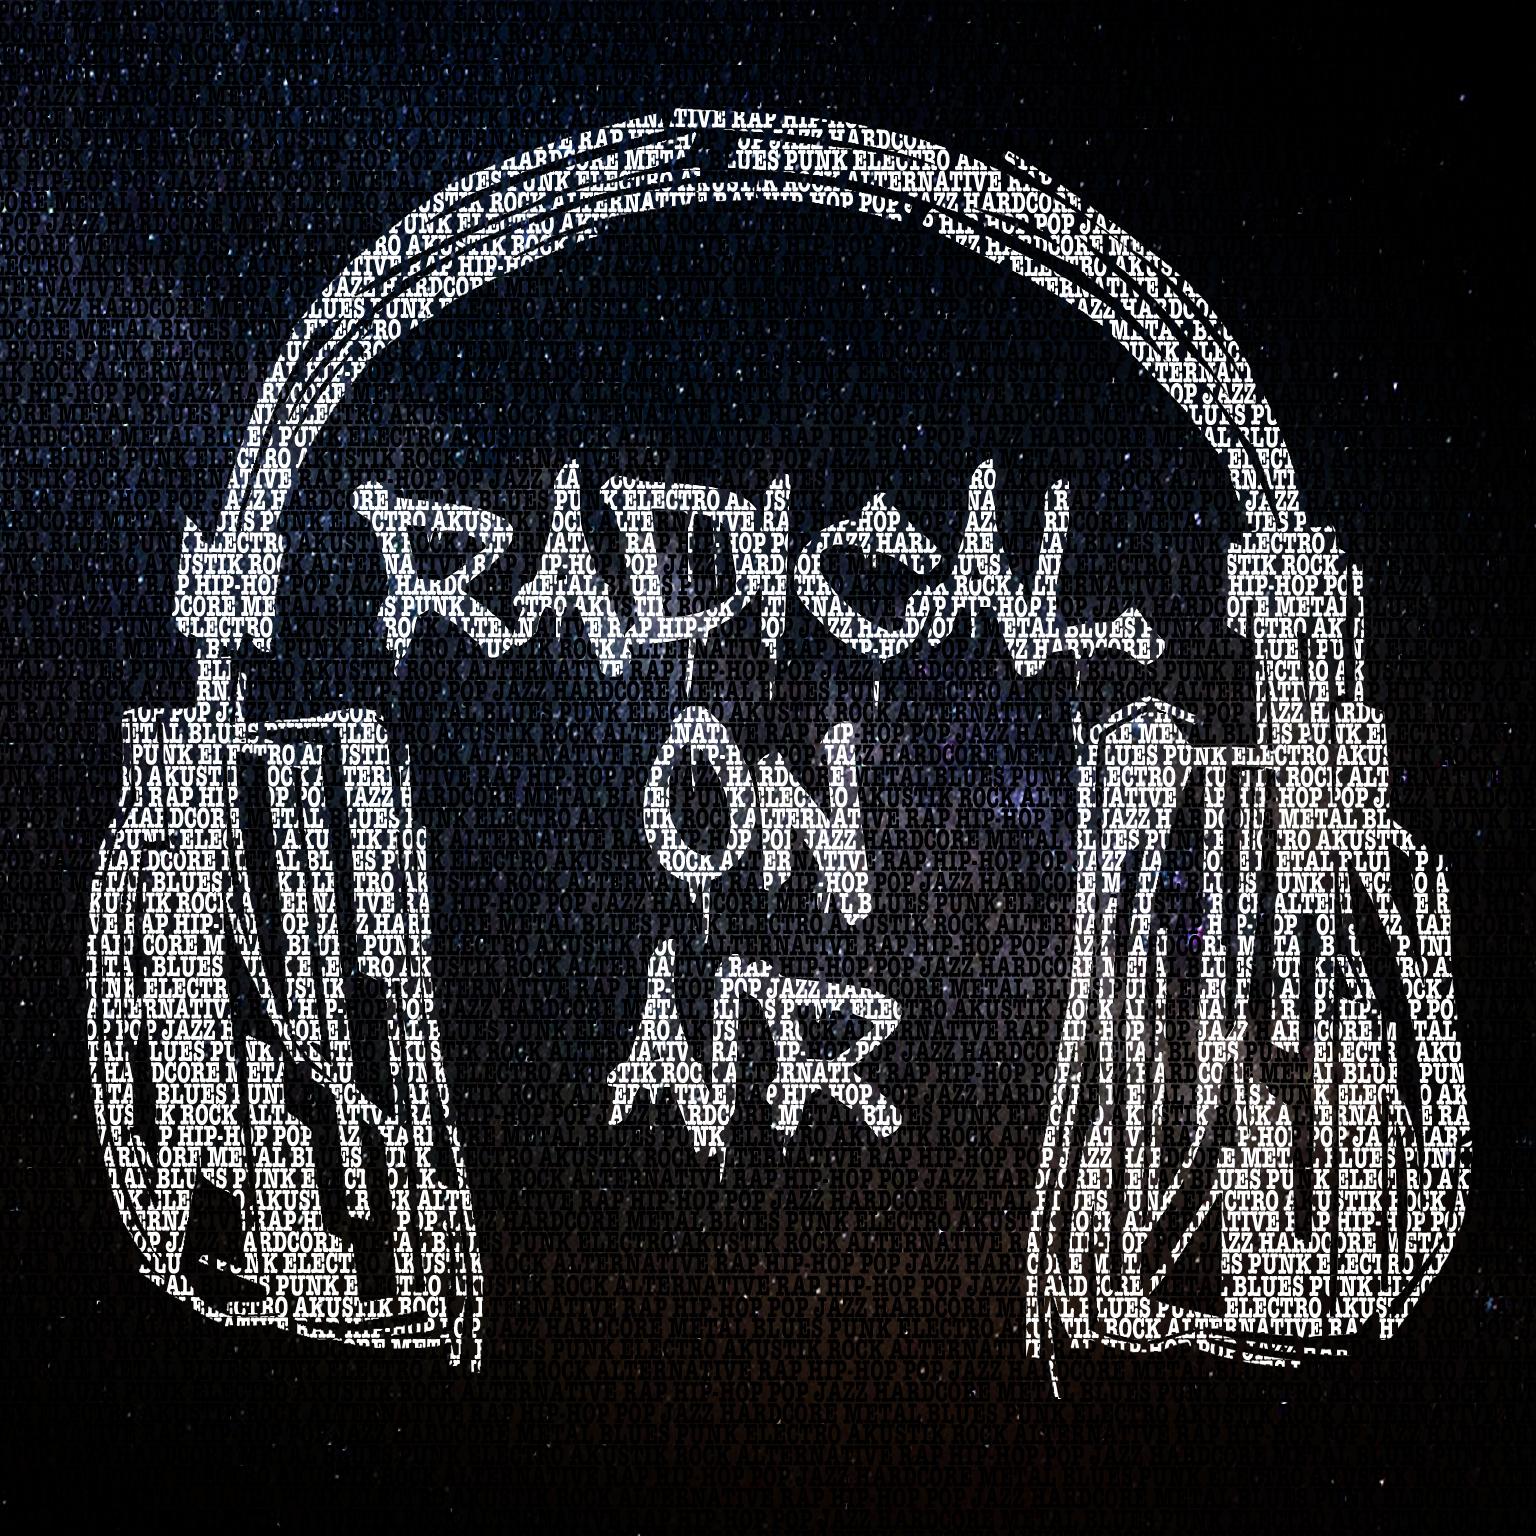 radicalONAIR vom 15.07.2021